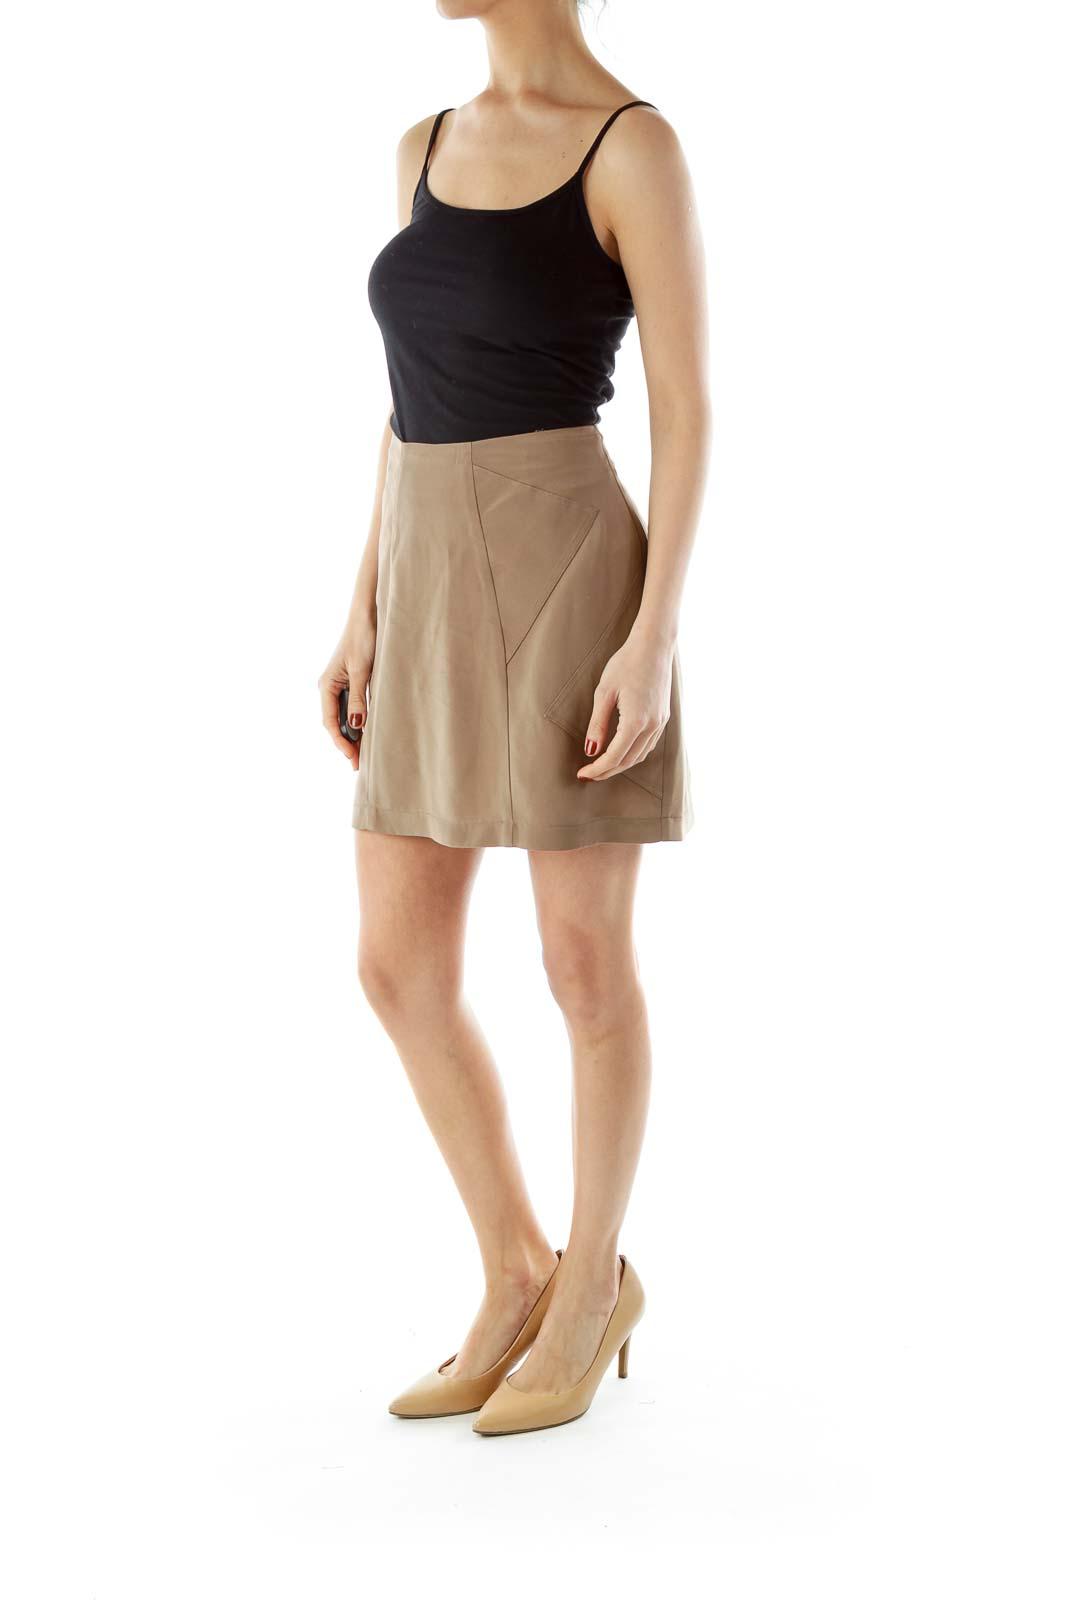 Green Zippered Mini Skirt